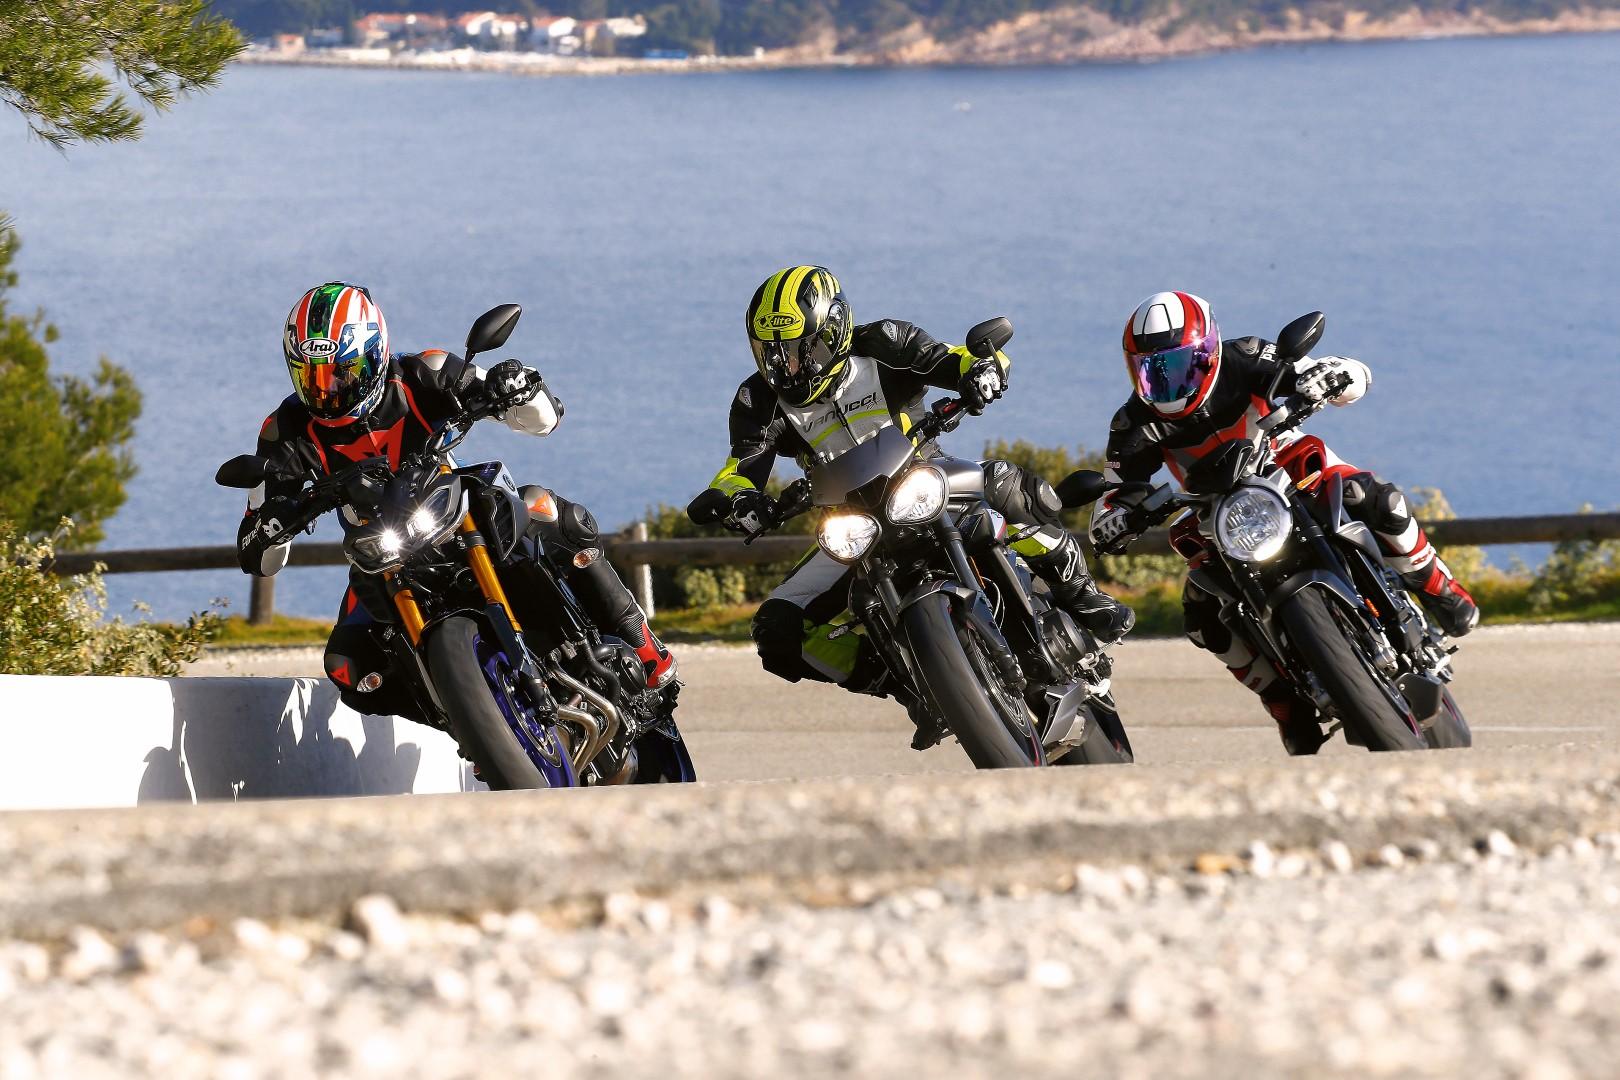 Comparativa tricilíndricas de lujo: MV Agusta Brutale 800 RR, Triumph Street Triple RS y Yamaha MT-09 SP